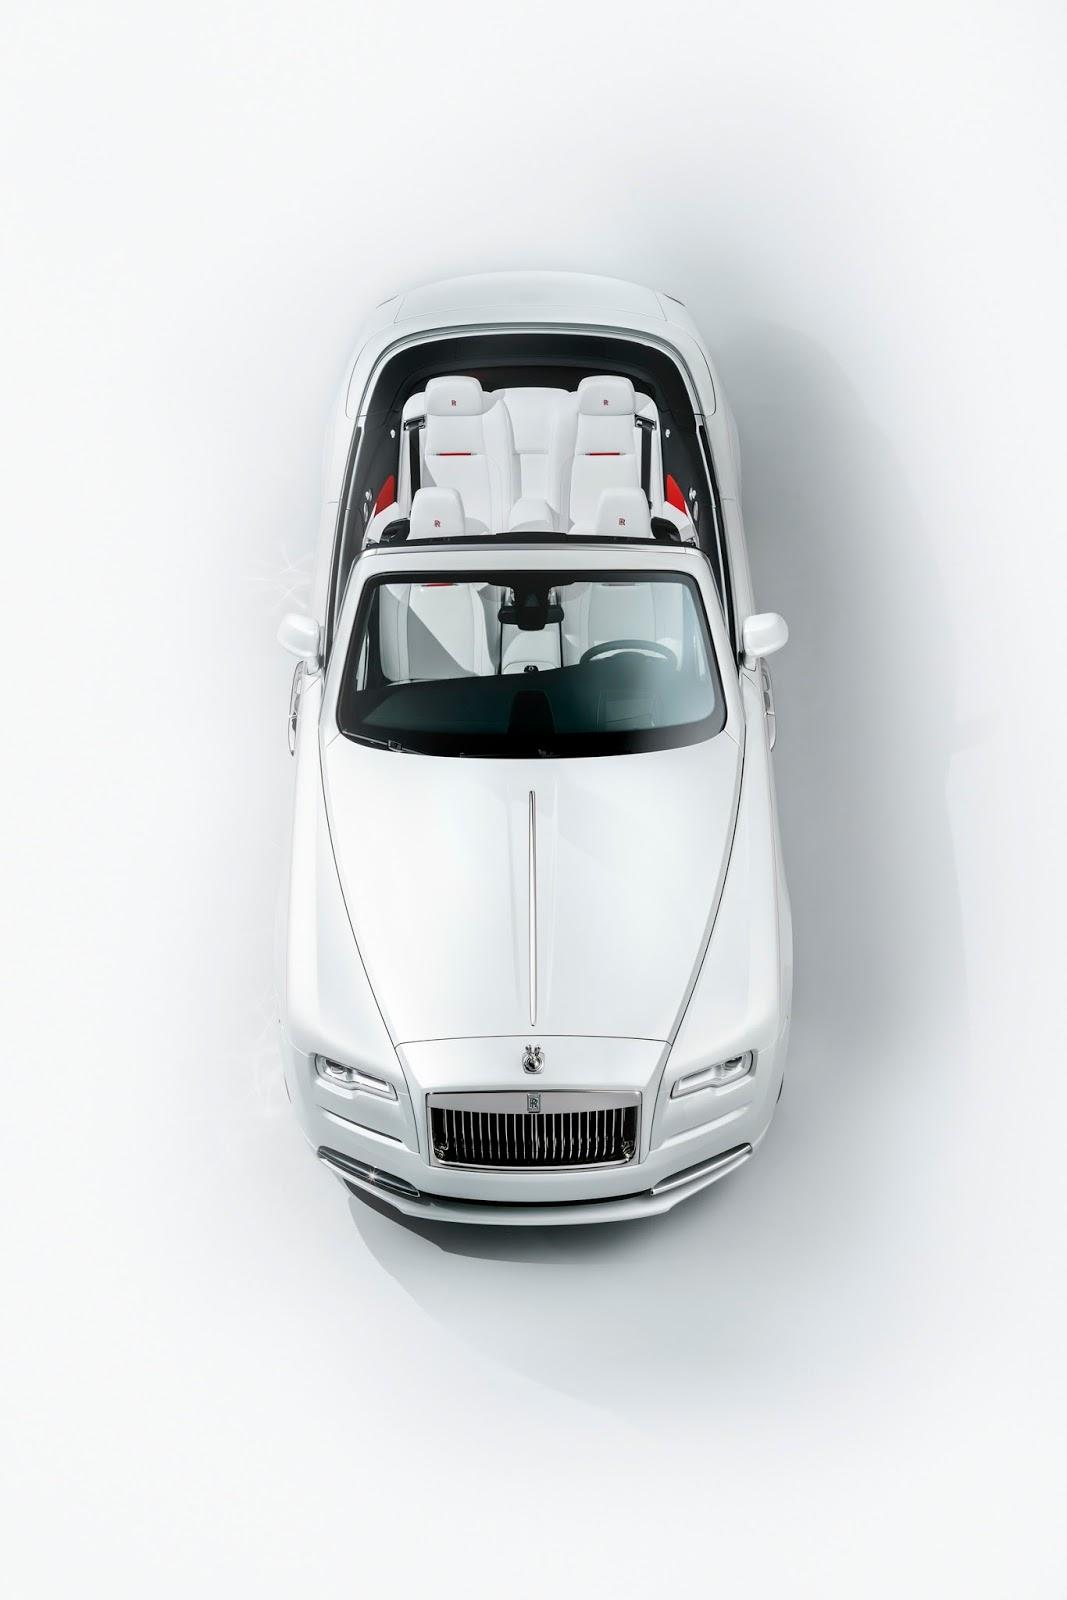 Rolls Royce Reveals Fashion Inspired Dawn Special Edition